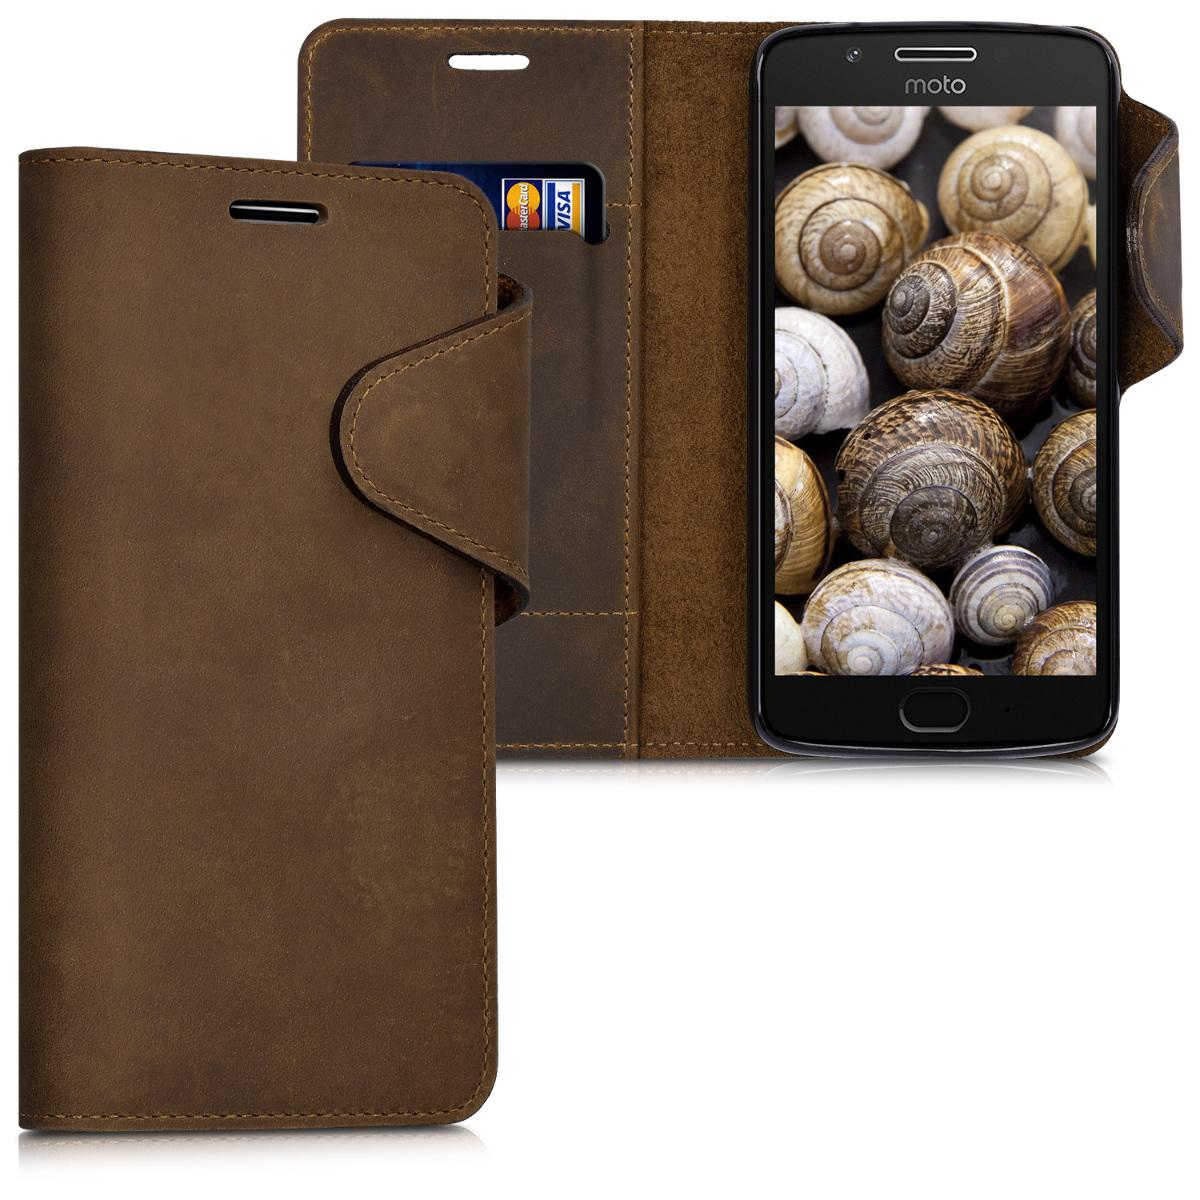 Kalibri Δερμάτινη Suede Θήκη - Πορτοφόλι Motorola Moto G5 - Καφέ(41078.05)